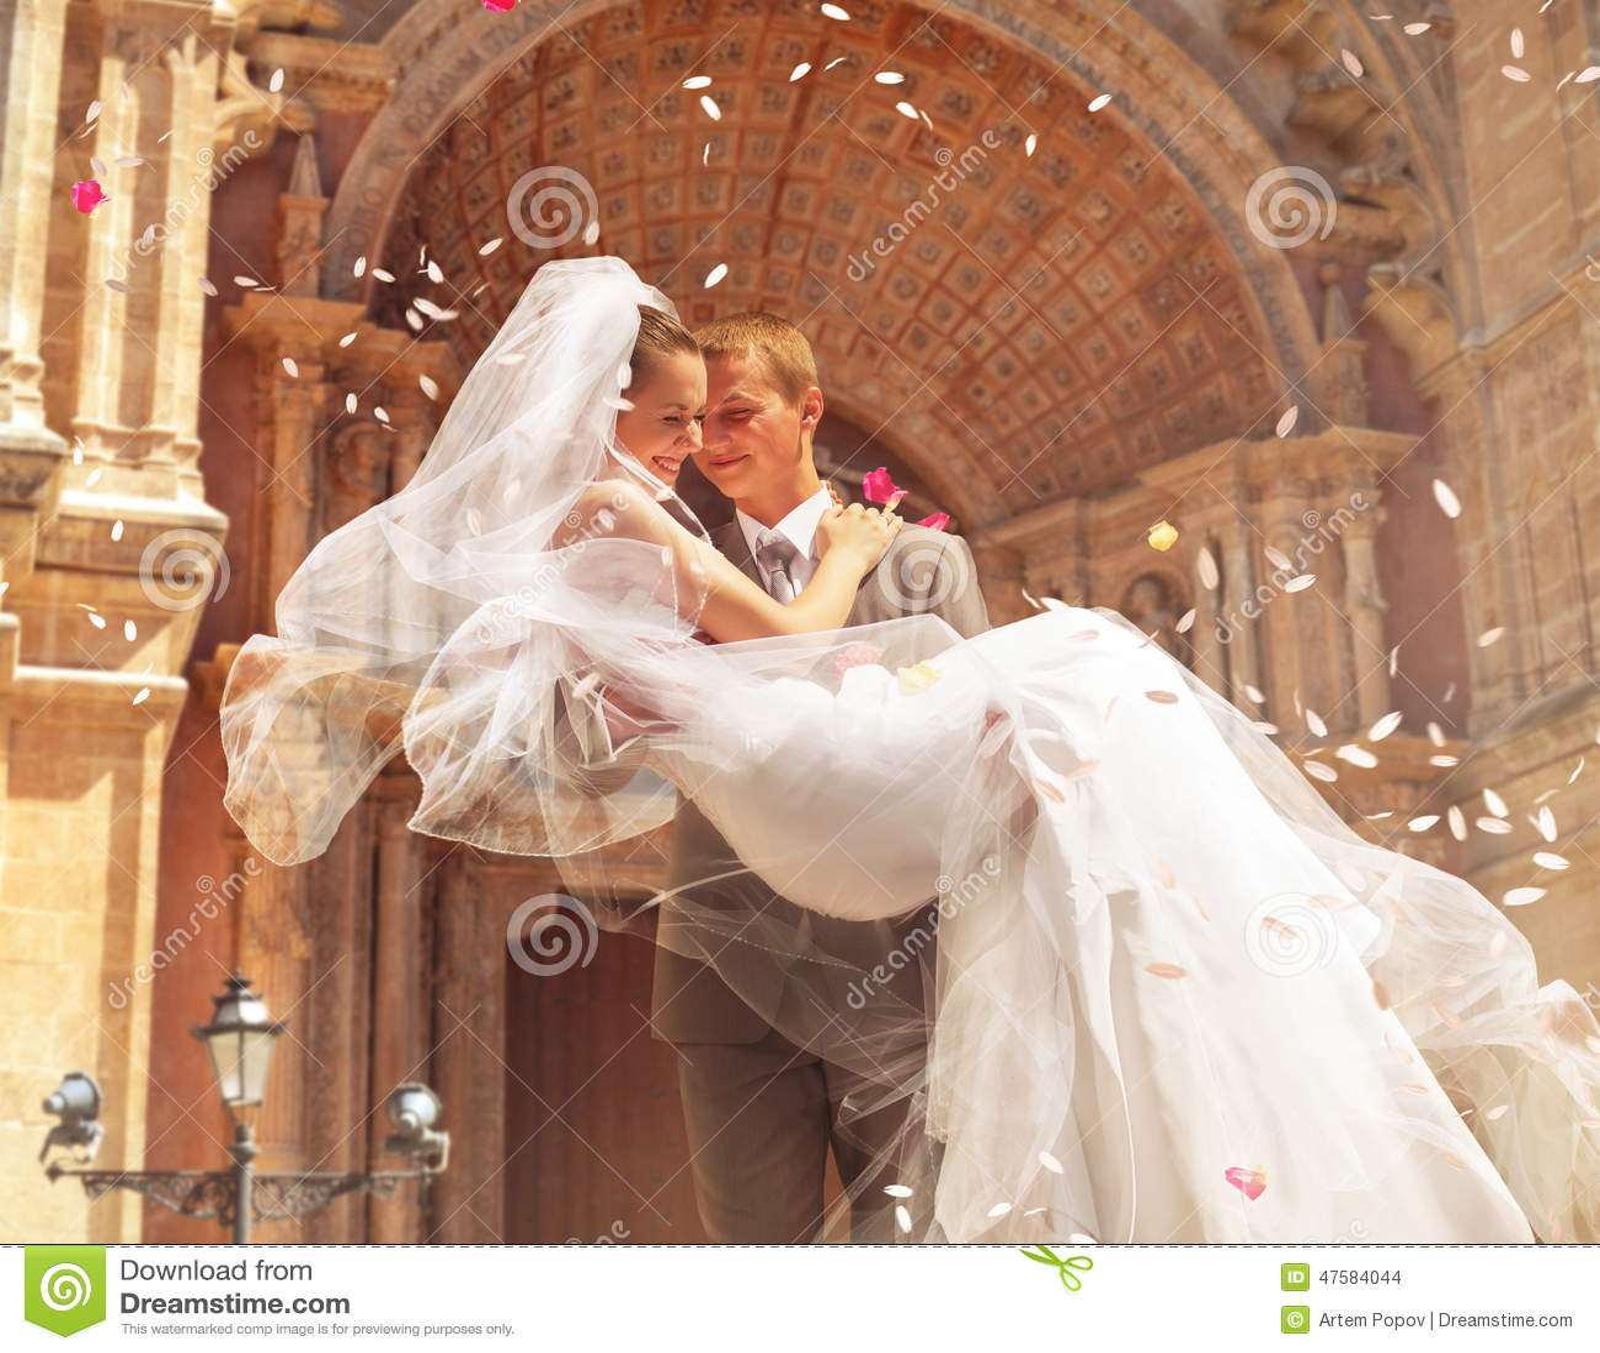 Bride And Groom Enjoying Amazing Sunset On A Beautiful: Groom Carrying Bride Near Church Stock Photo